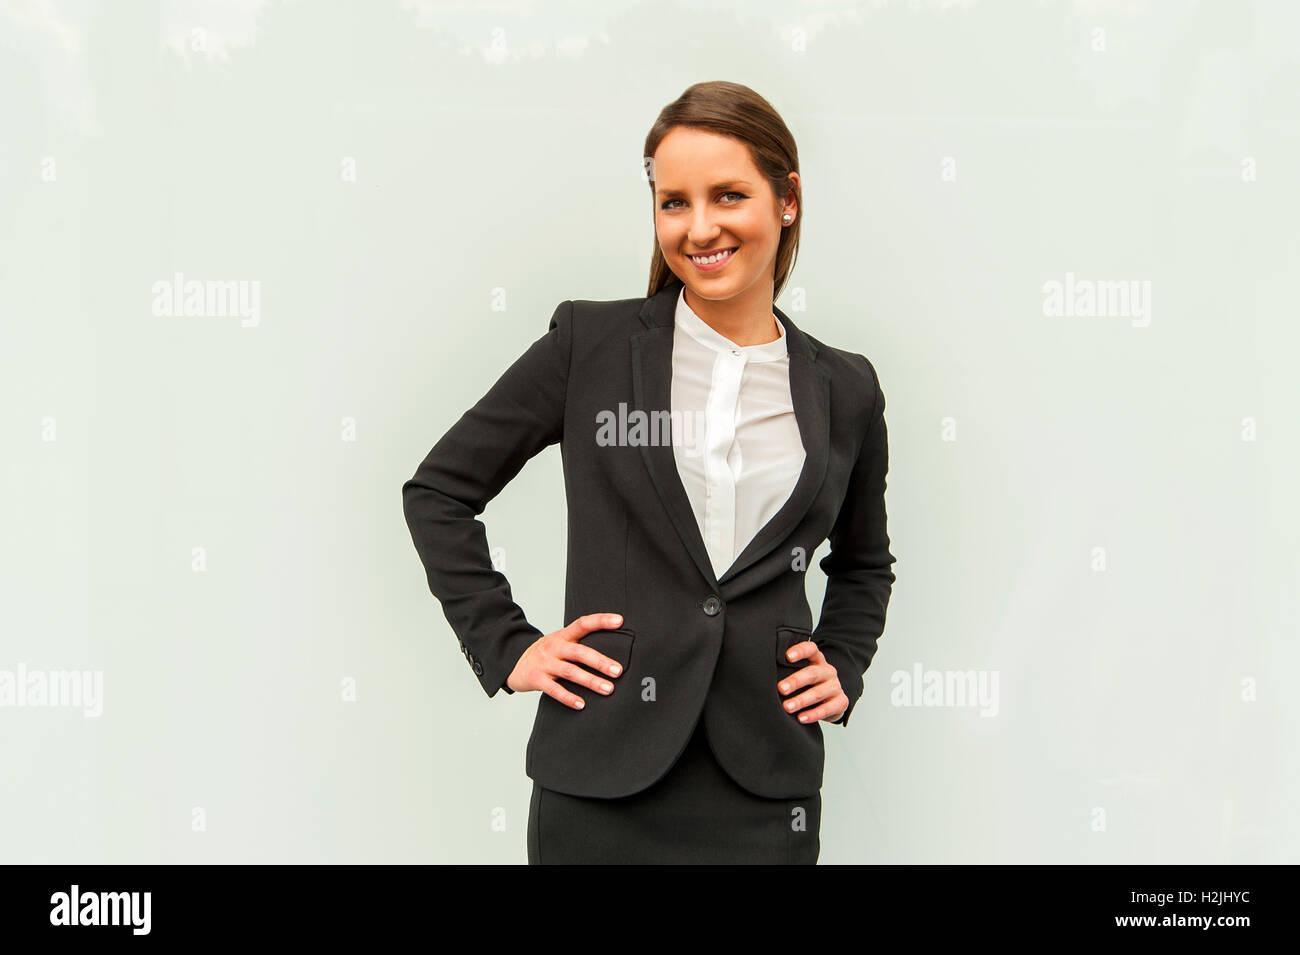 Junge Frau Im Business Outfit Uber Die Glaswand In Der Stadt In Die Kamera Lacheln Stockfotografie Alamy